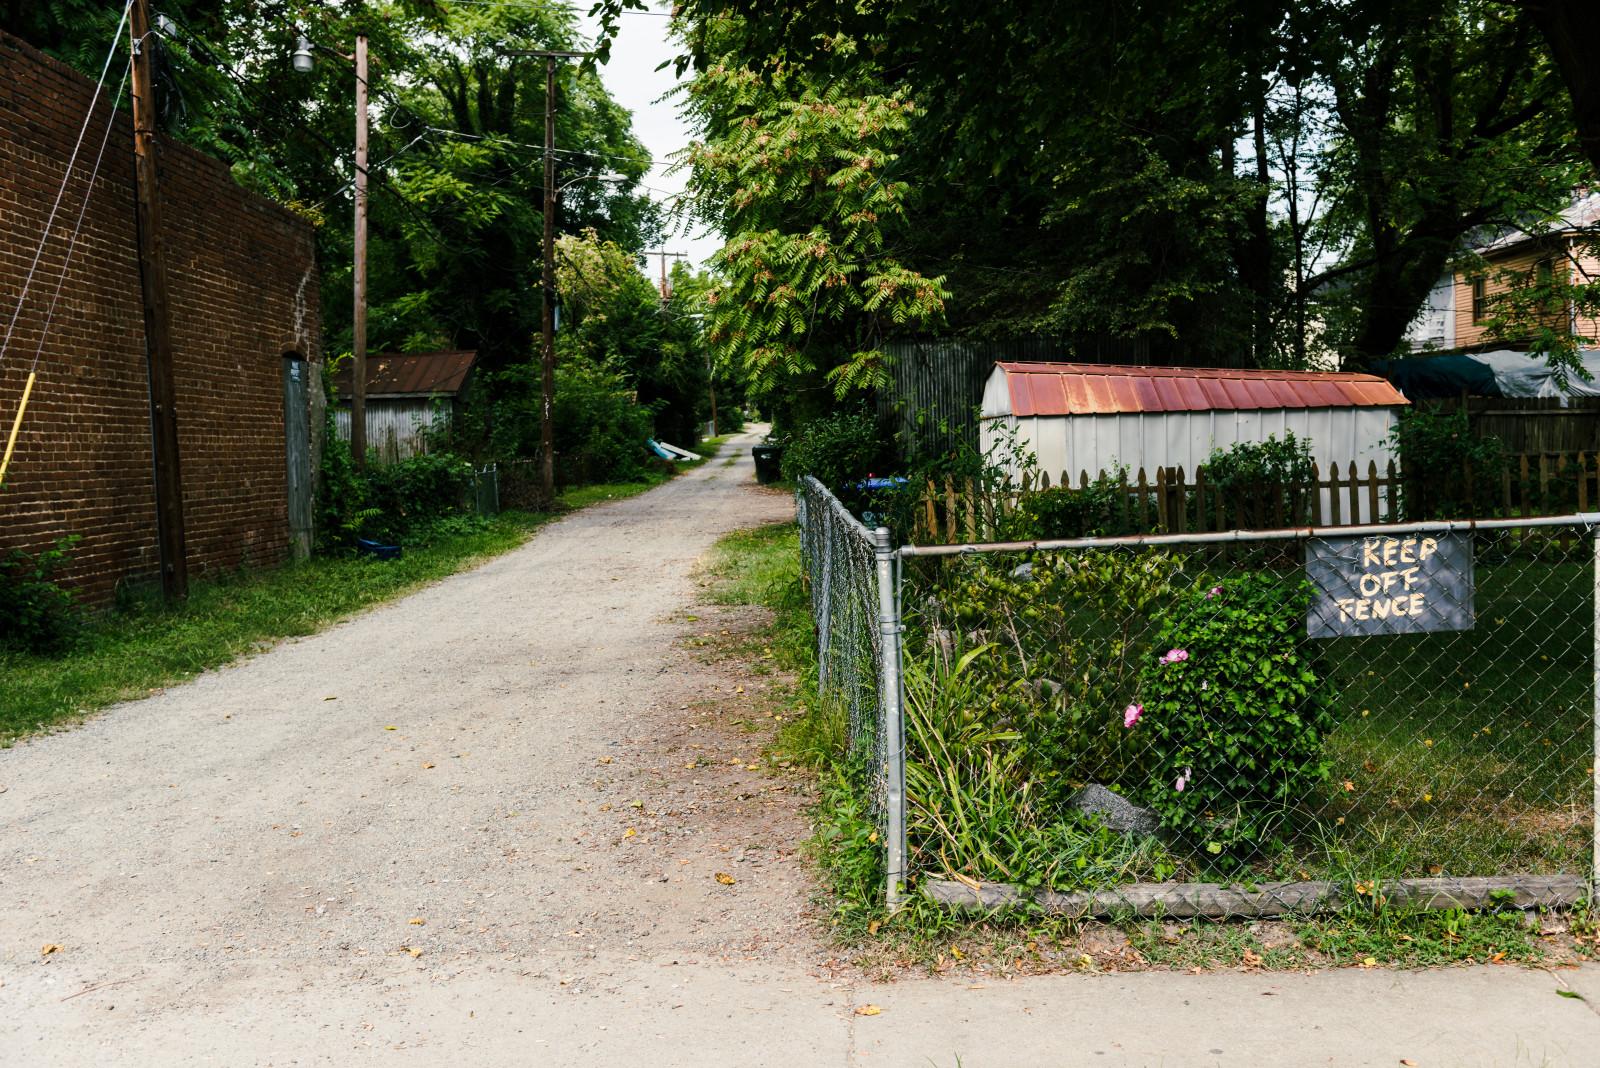 Between Enslow Avenue and Carolina Avenue, off of Meadowbridge Road